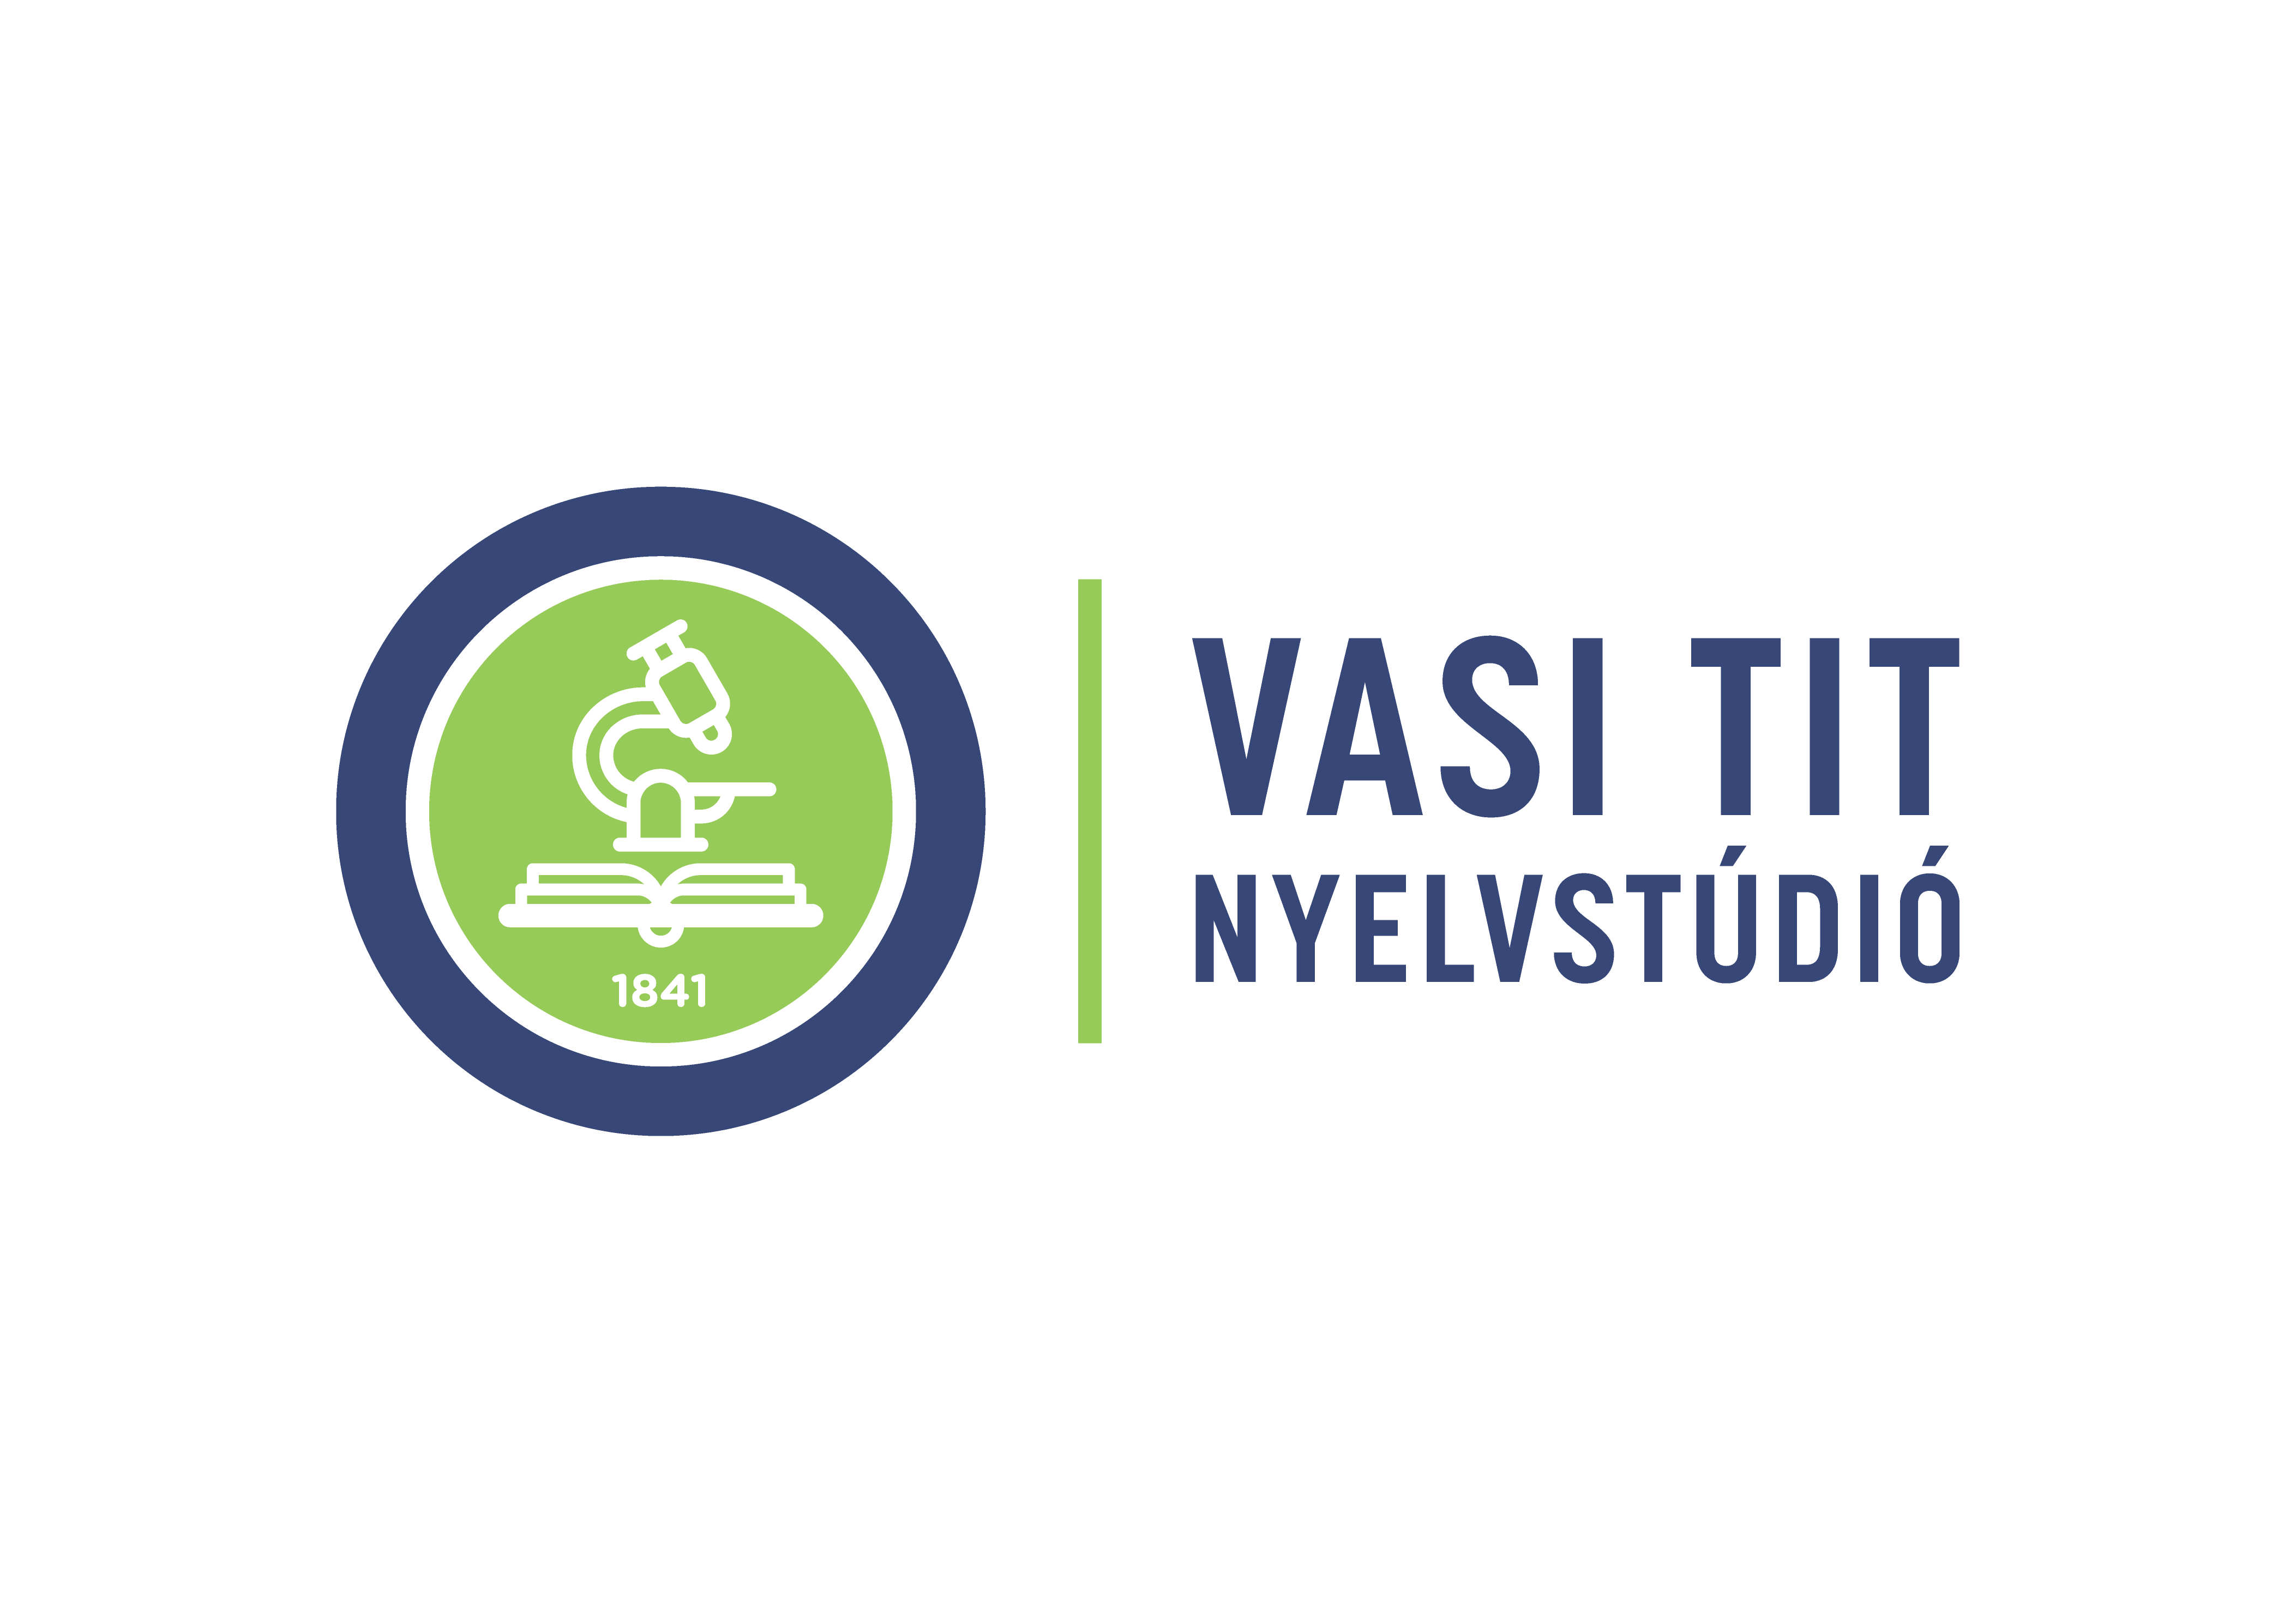 Vasi TIT Nyelvstúdió